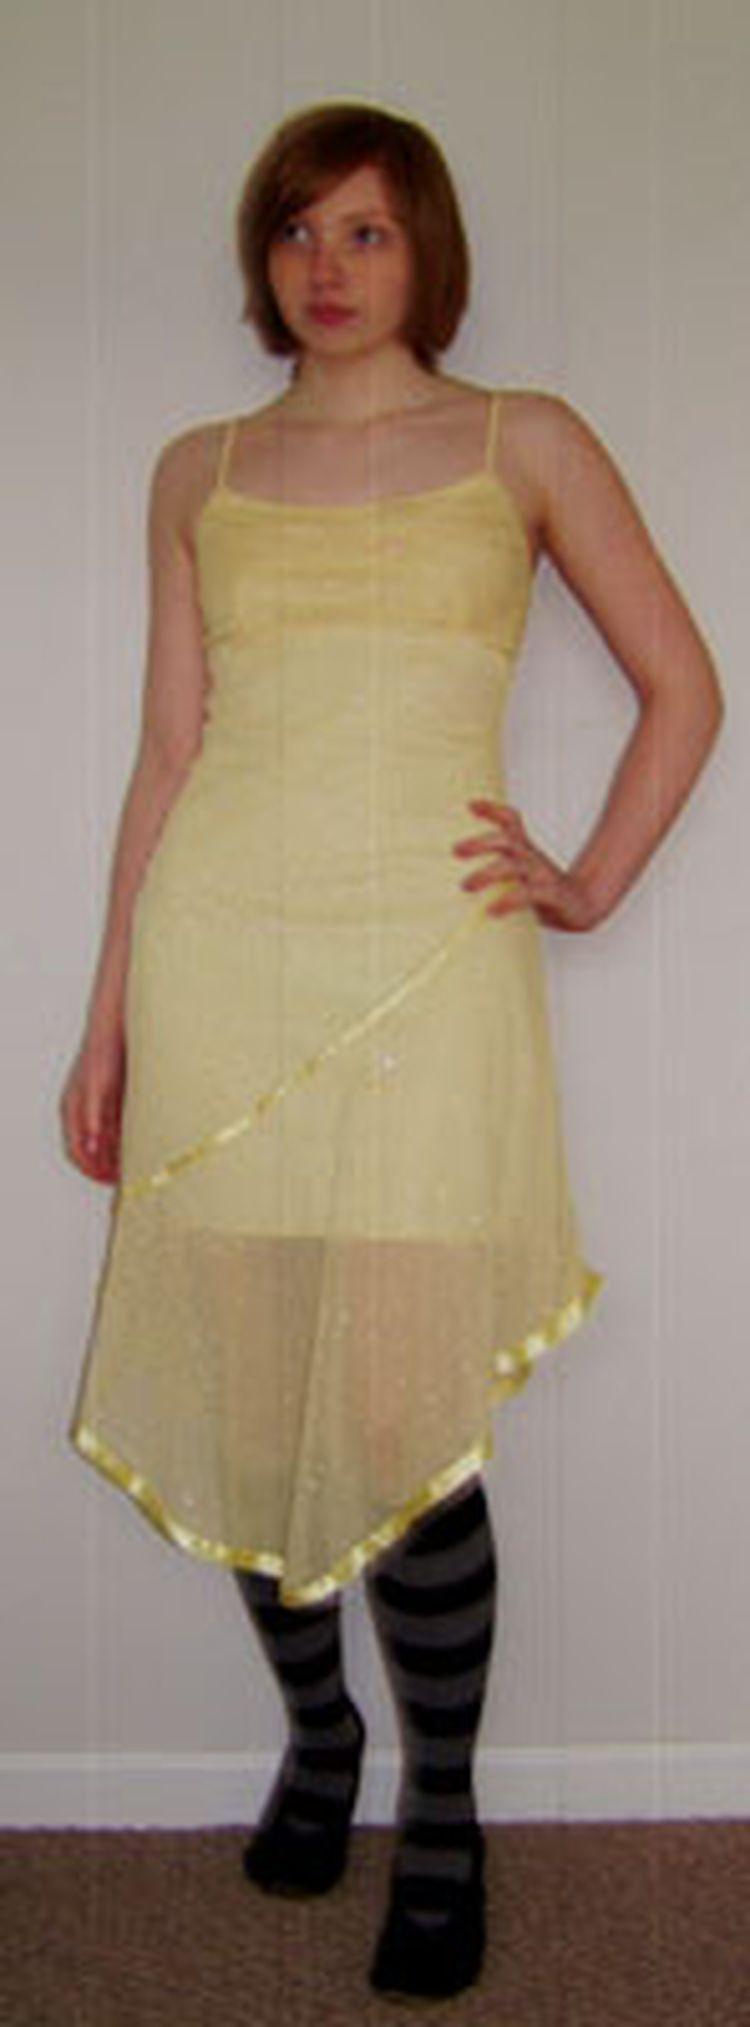 Easy dress tutorials for beginners dress patterns free